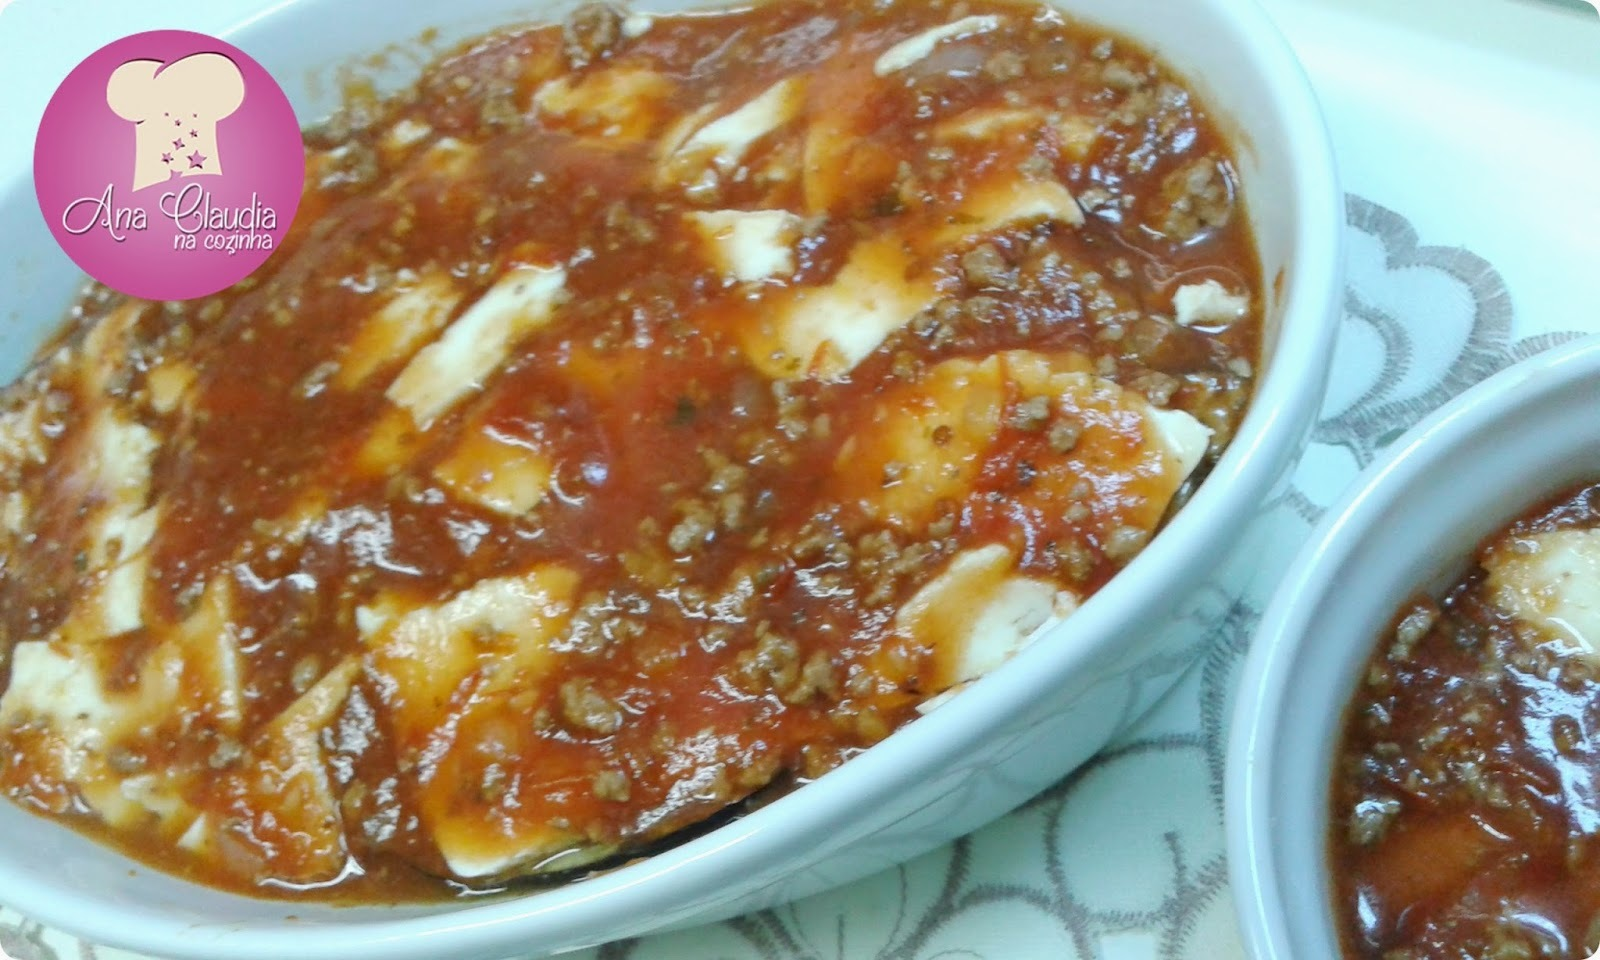 berinjela a parmegiana com carne moida